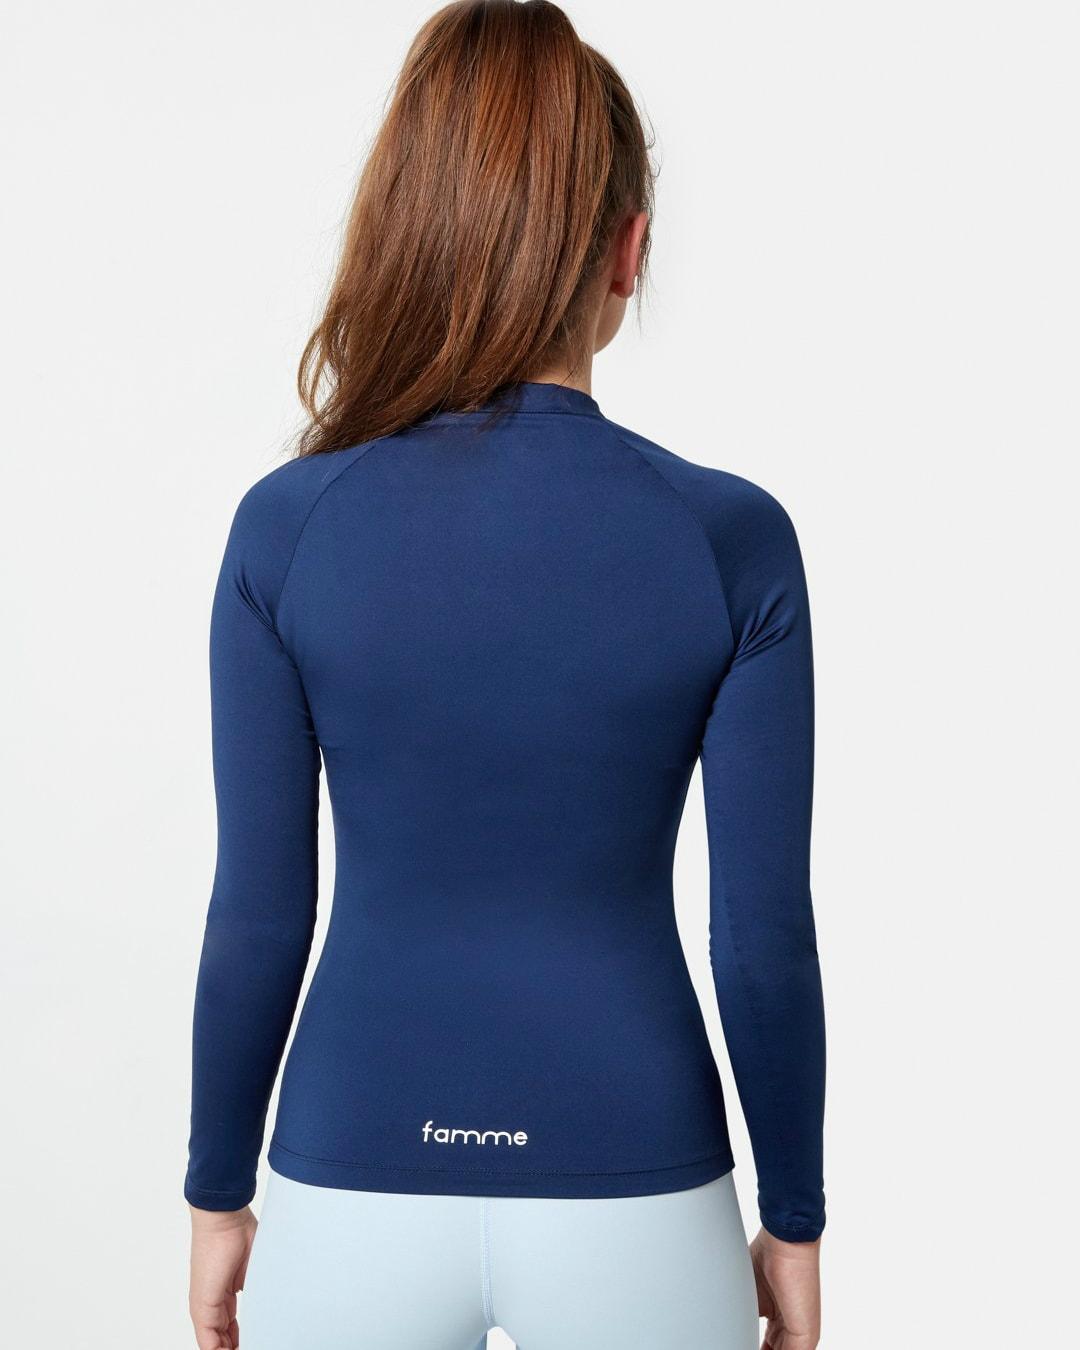 famme_Navy-Blue-Essential_Long-Sleeve2